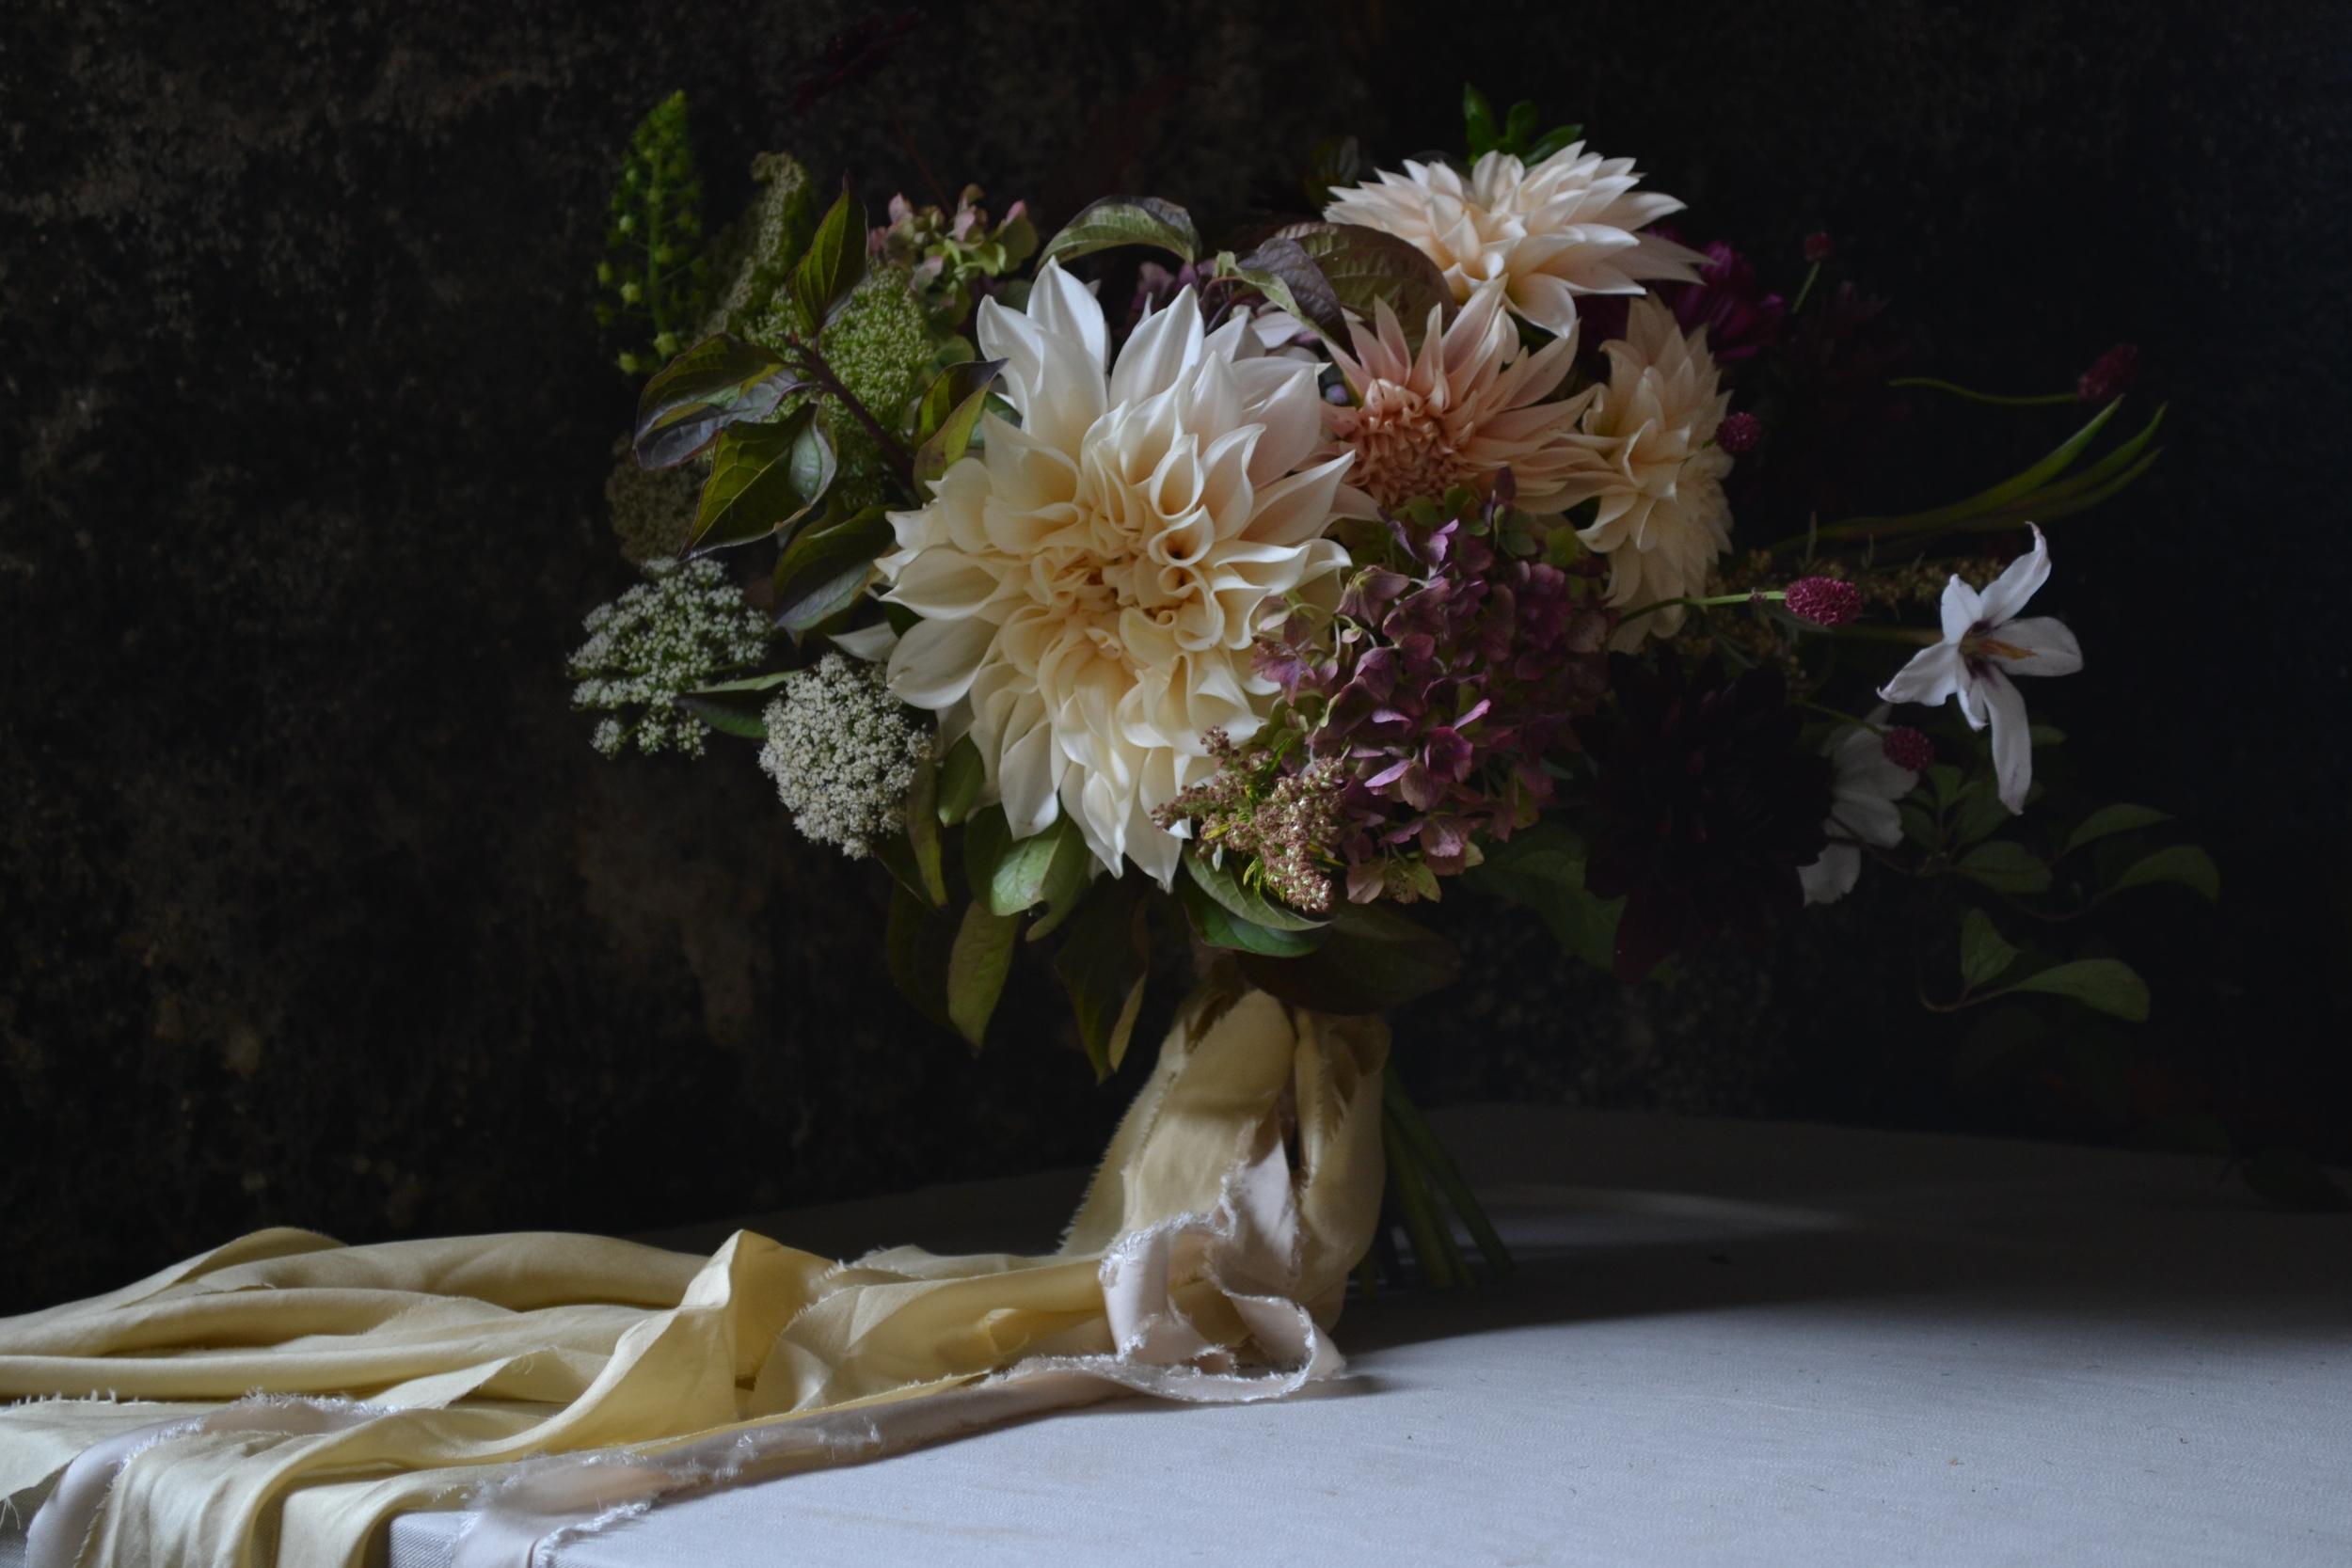 141024 - GG - Helens bridal flowers 010.JPG